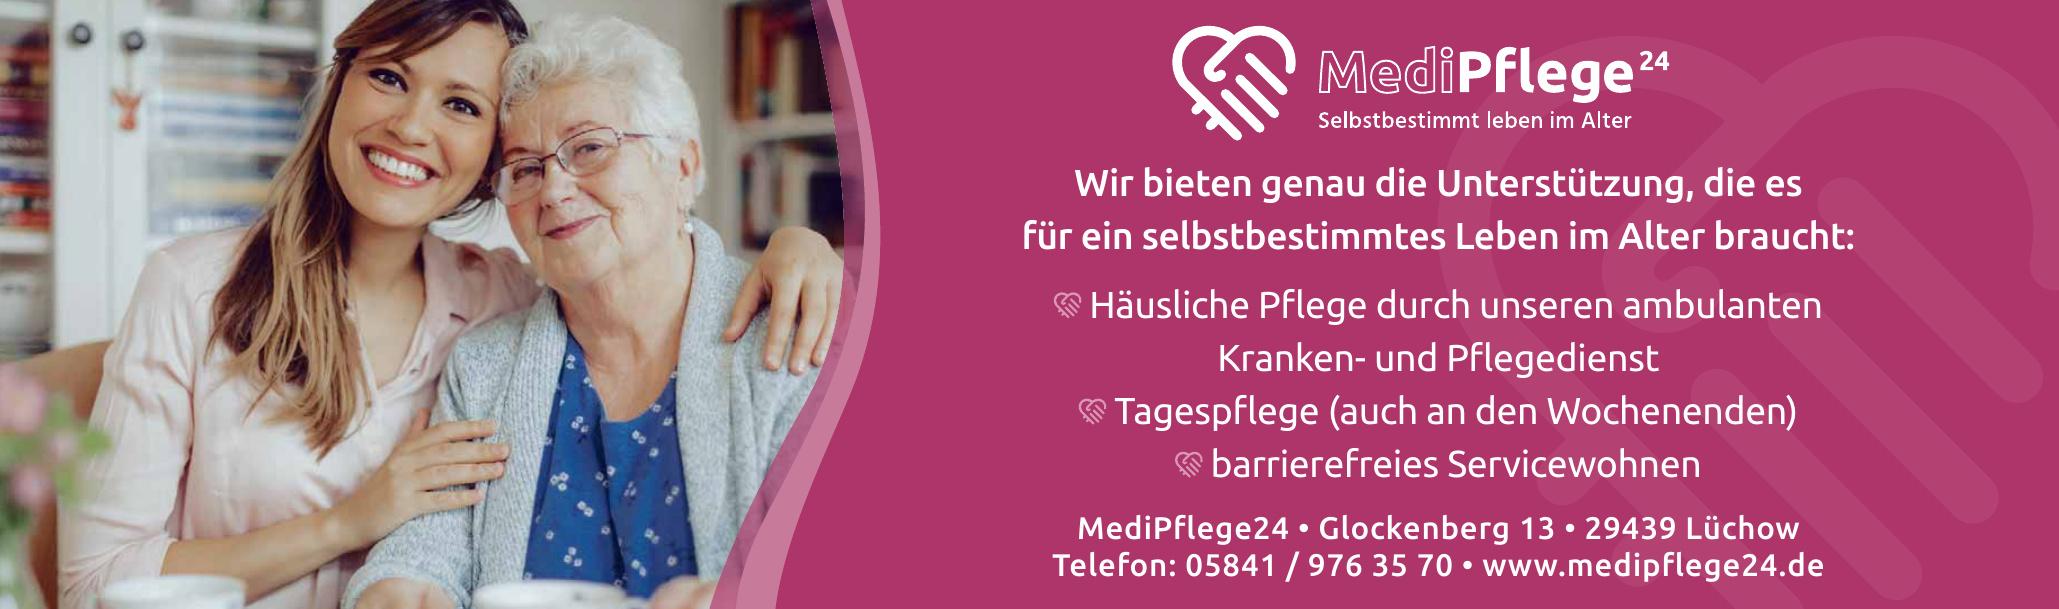 MediPflege24